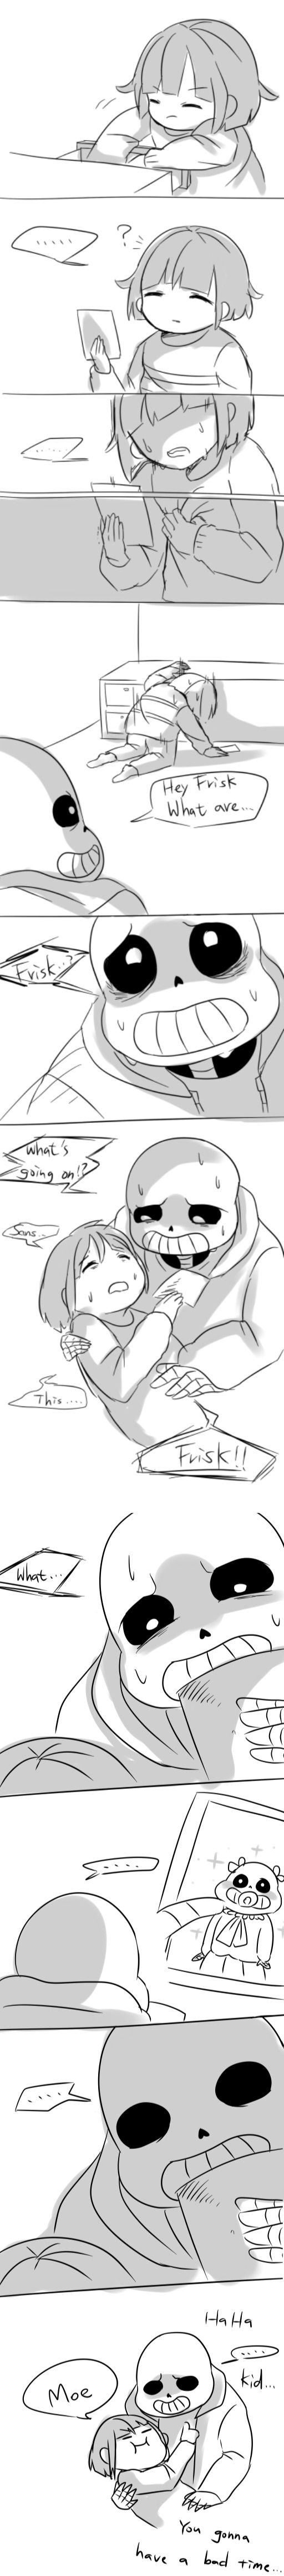 Frisk and Sans - comic - lol